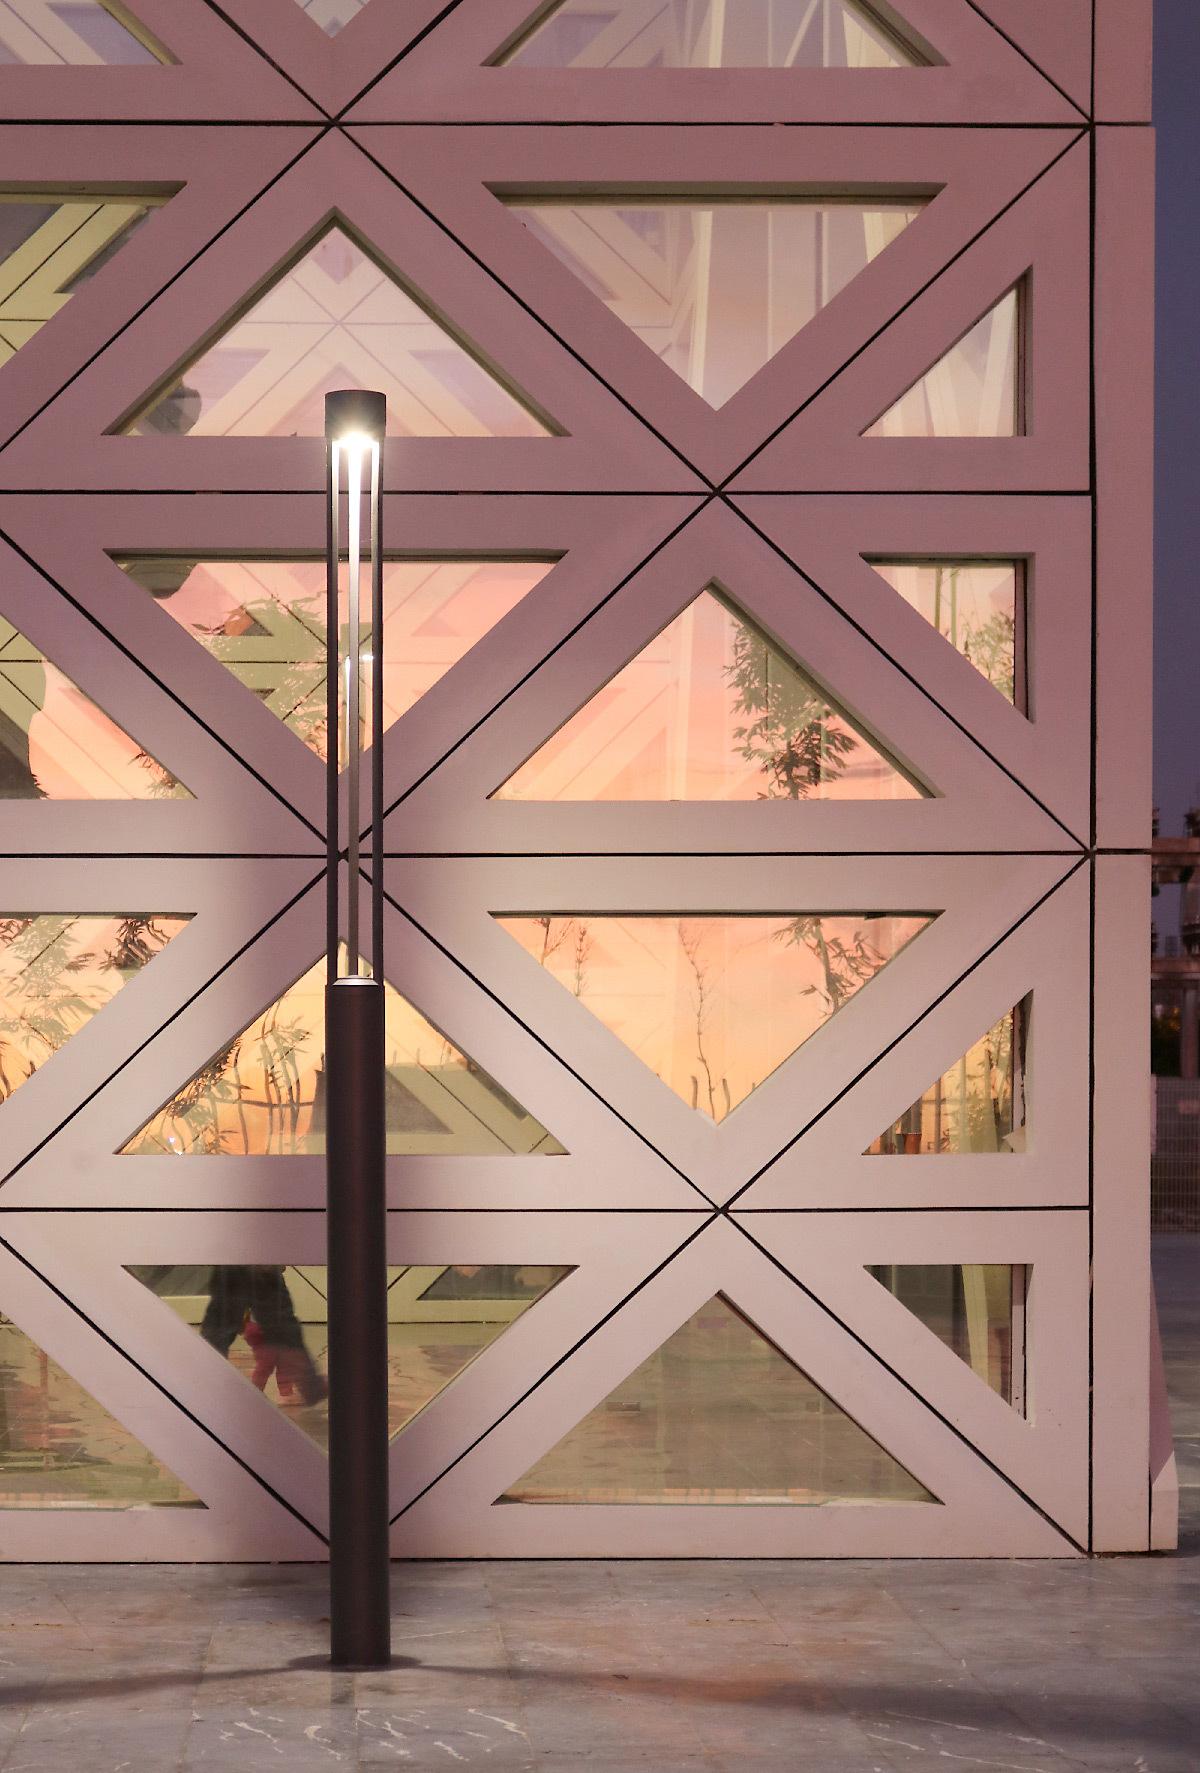 Lumière sur mat, gare de Kénitra, Maroc - Architectes : OKA, SDA